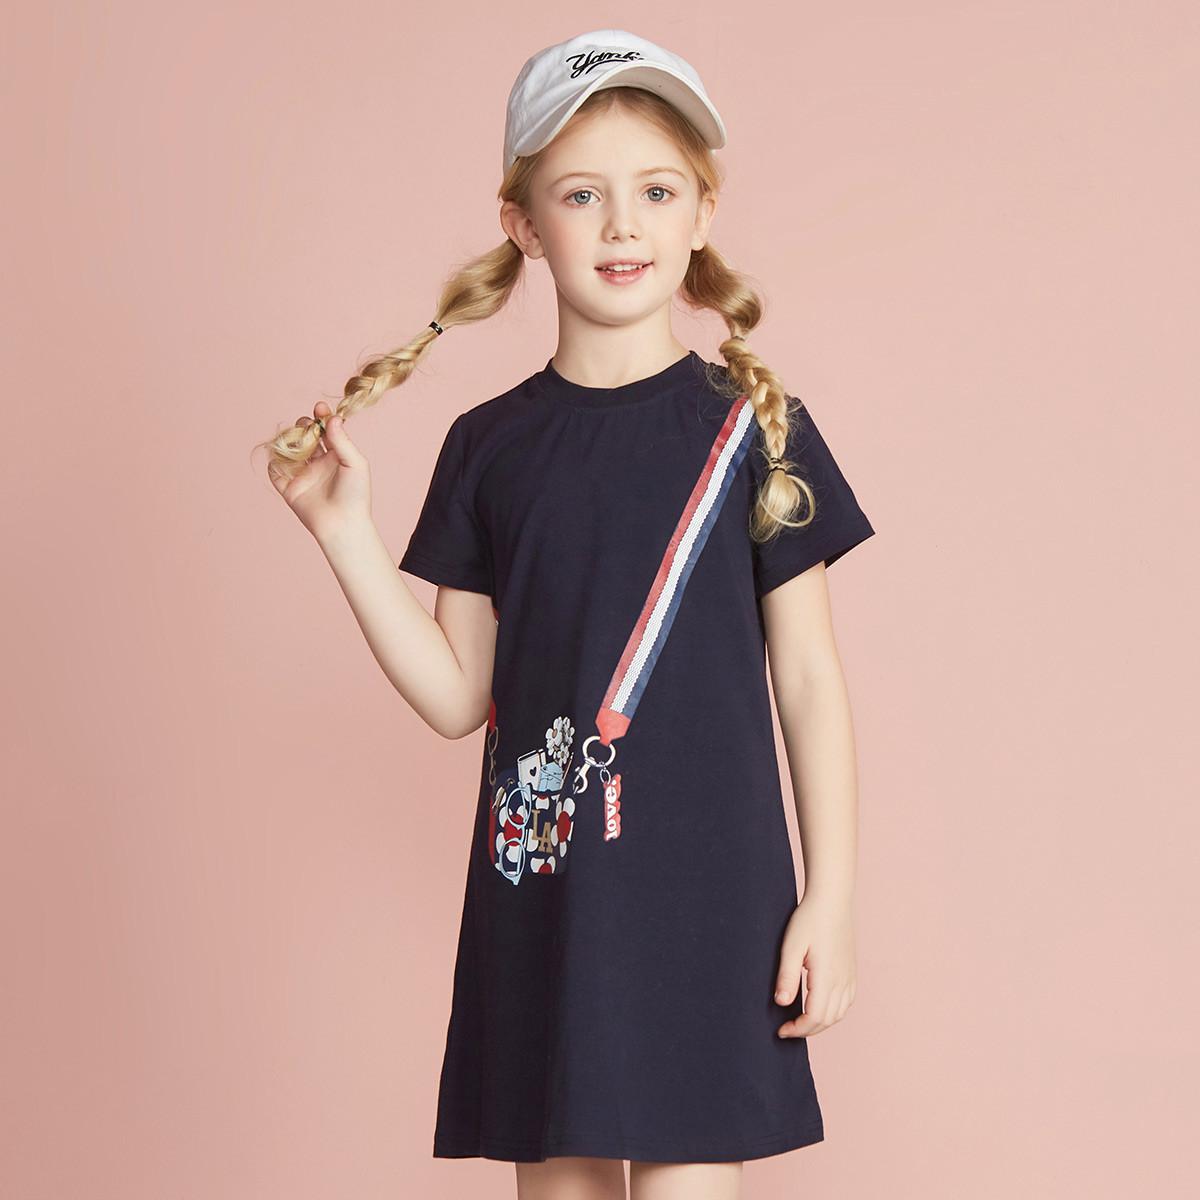 La Chapelle 拉夏貝爾 女童短袖休閑連衣裙